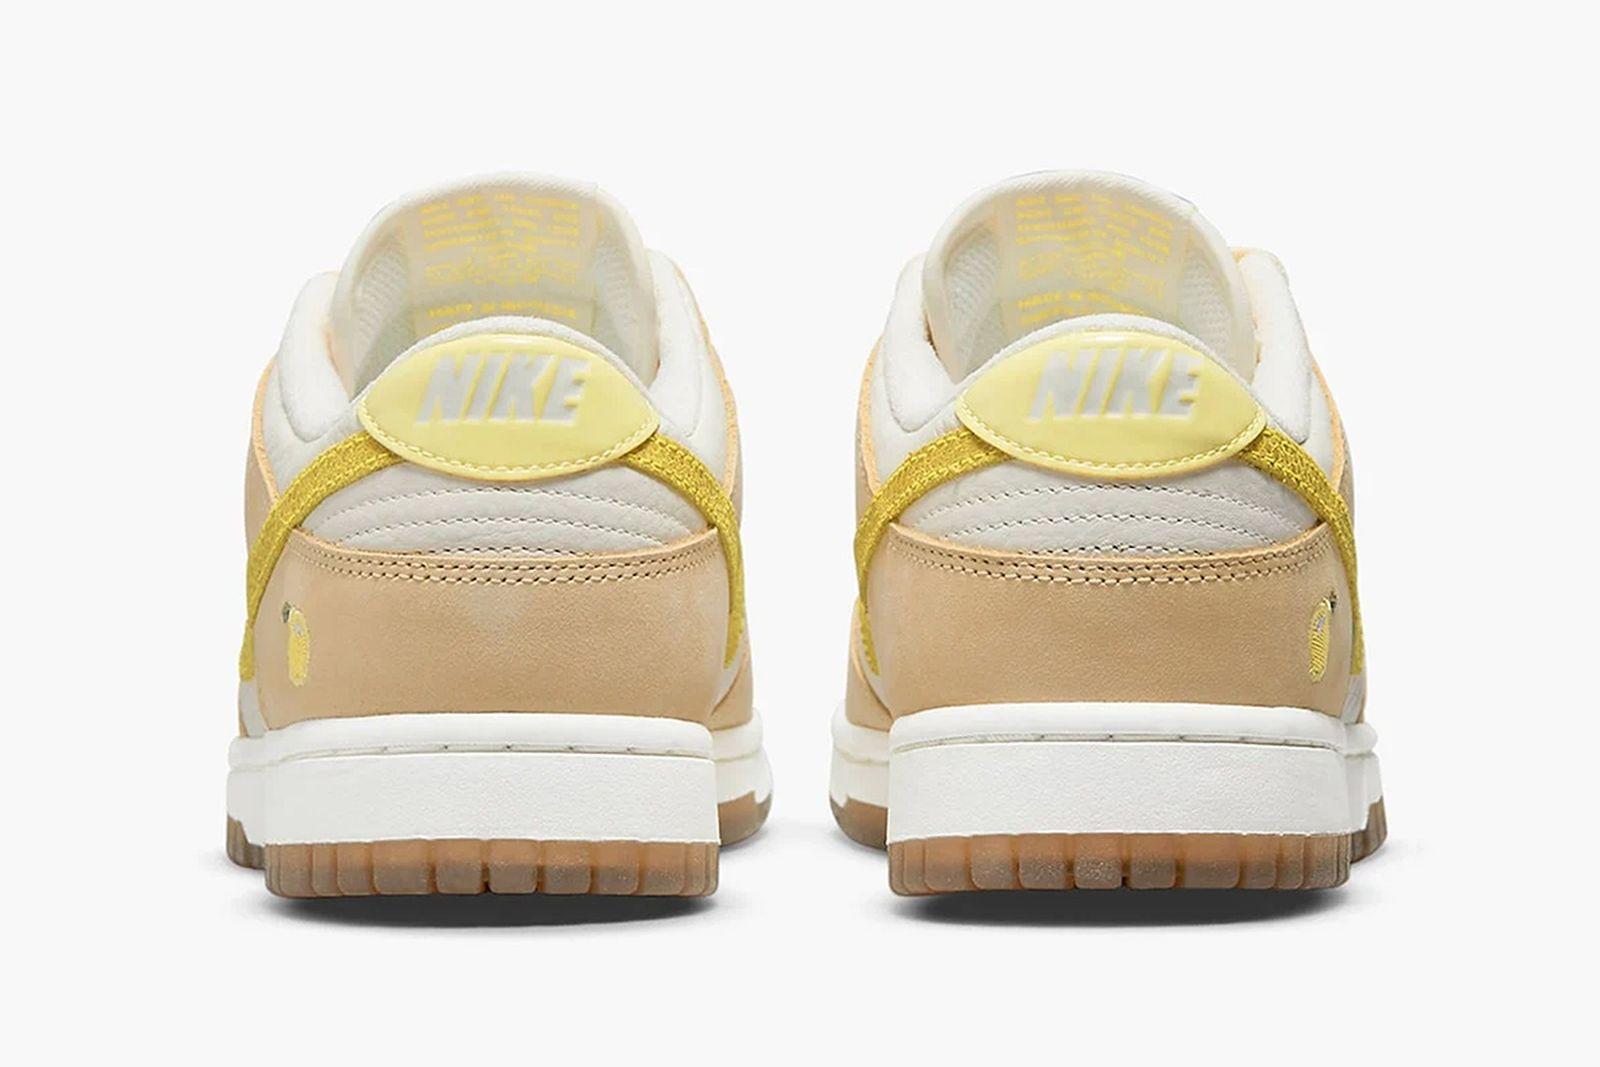 nike-dunk-low-lemon-drop-release-date-price-05